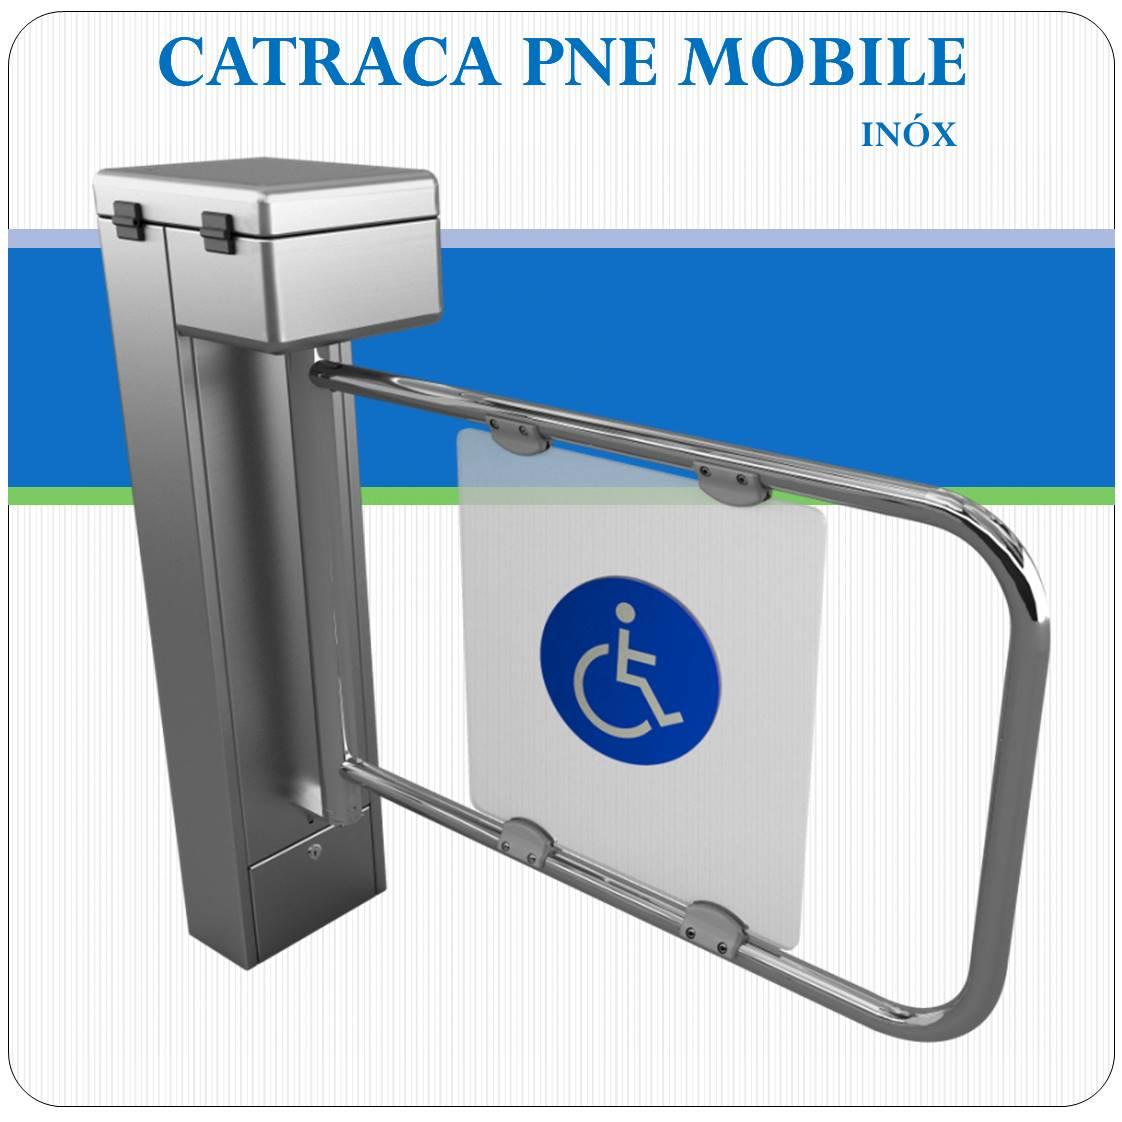 Catraca PNE Mobile